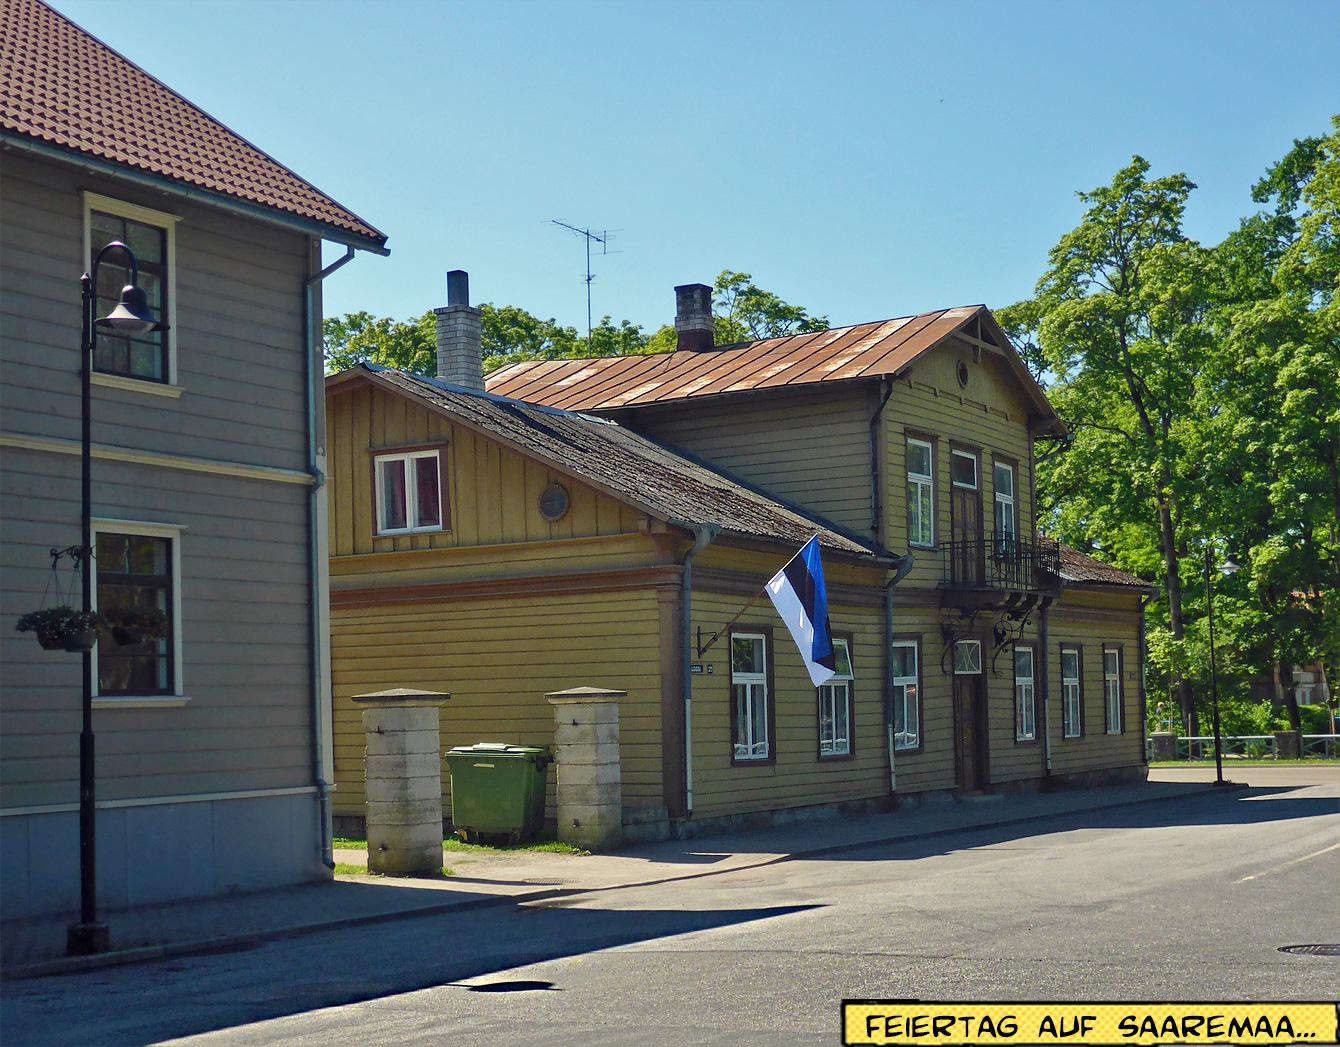 Holzhaus mit Flagge Estland